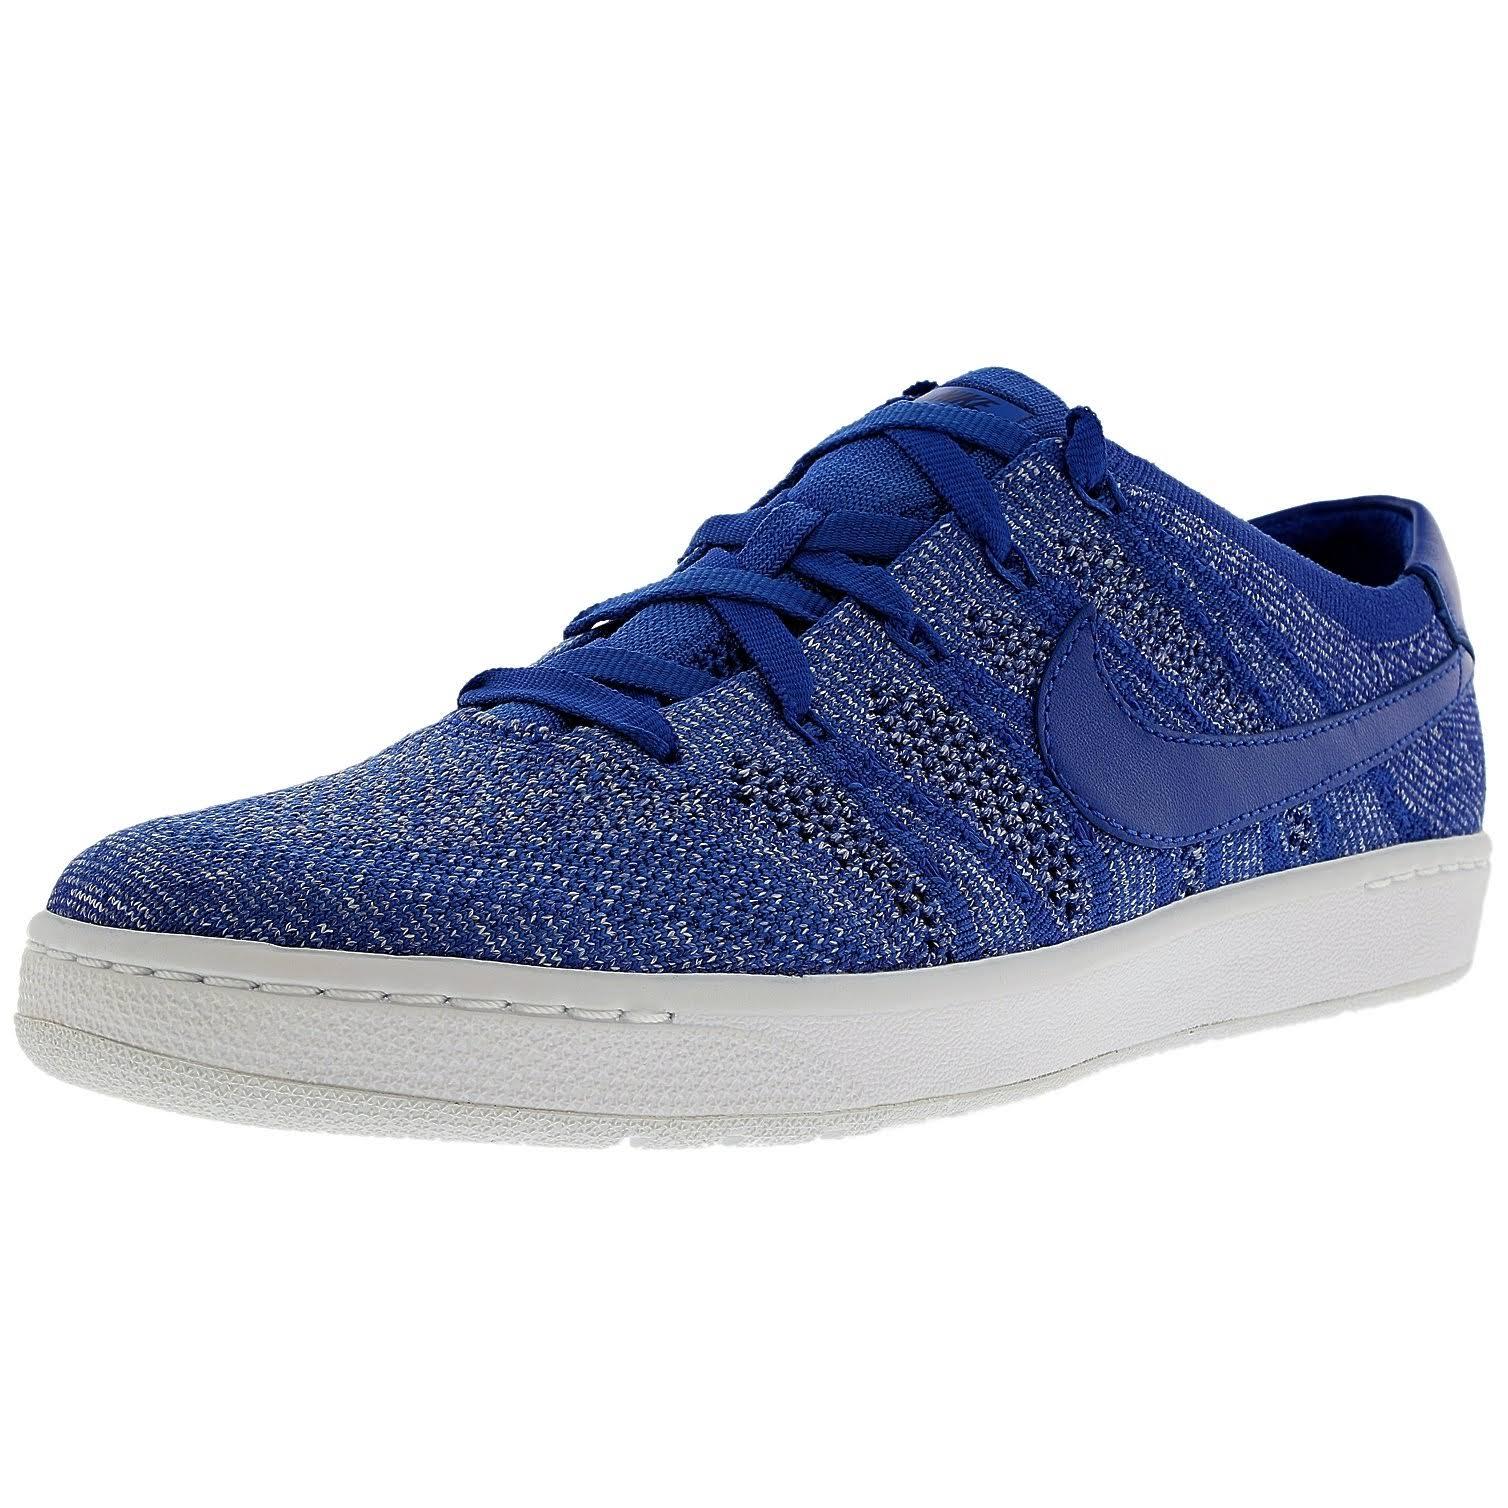 Hombre 11 Para Ultra 830704400 Nike Tamaño Tennis Flyknit Classic Zapatos YUBpq7w